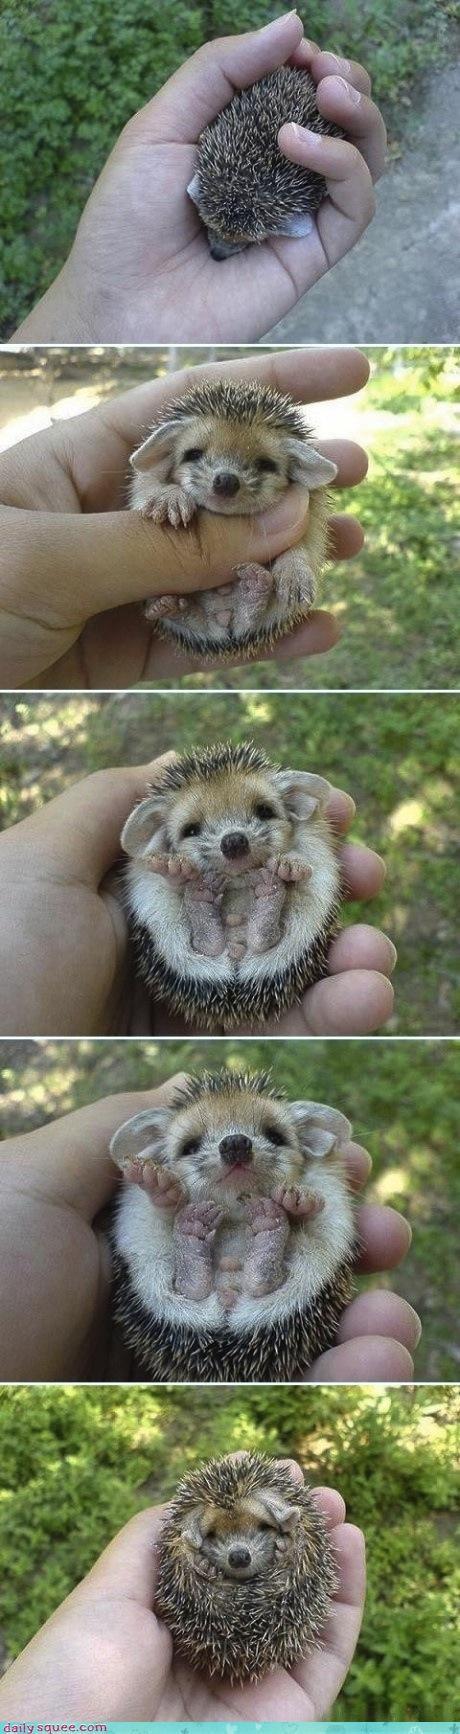 cute hedgehog slow motion sonic sonic the hedgehog technology - 4500474880